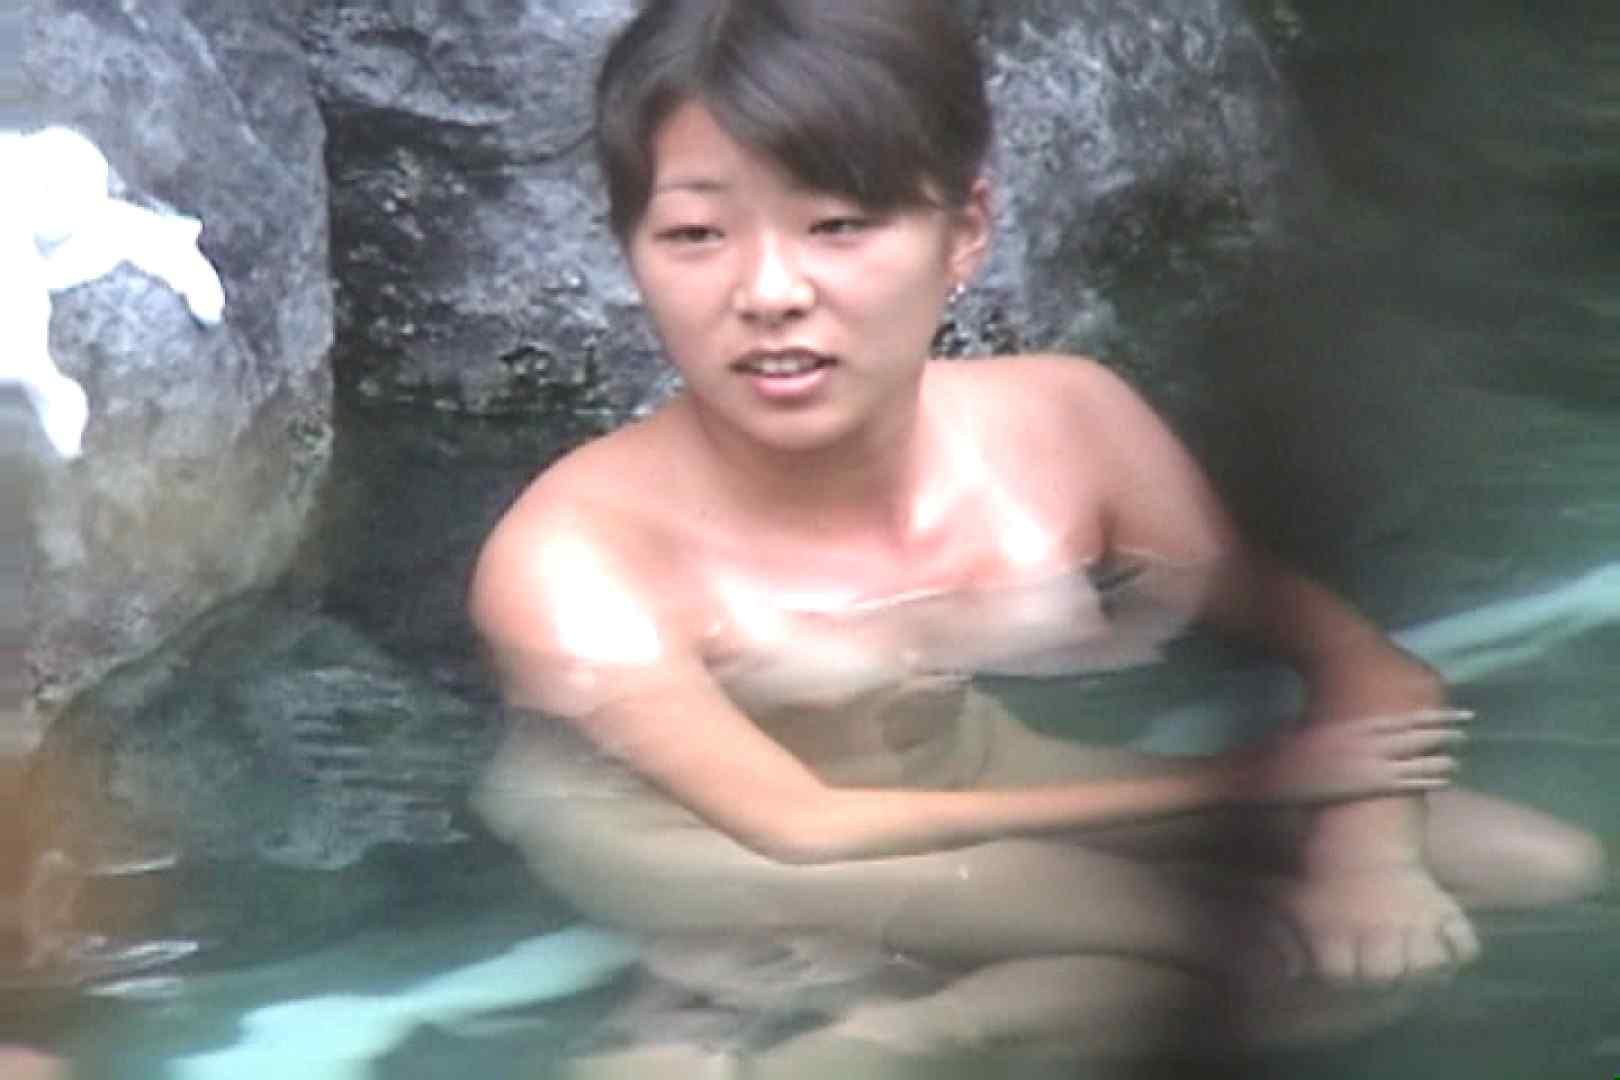 Aquaな露天風呂Vol.69【VIP限定】 OLのエロ生活   露天風呂  106連発 94